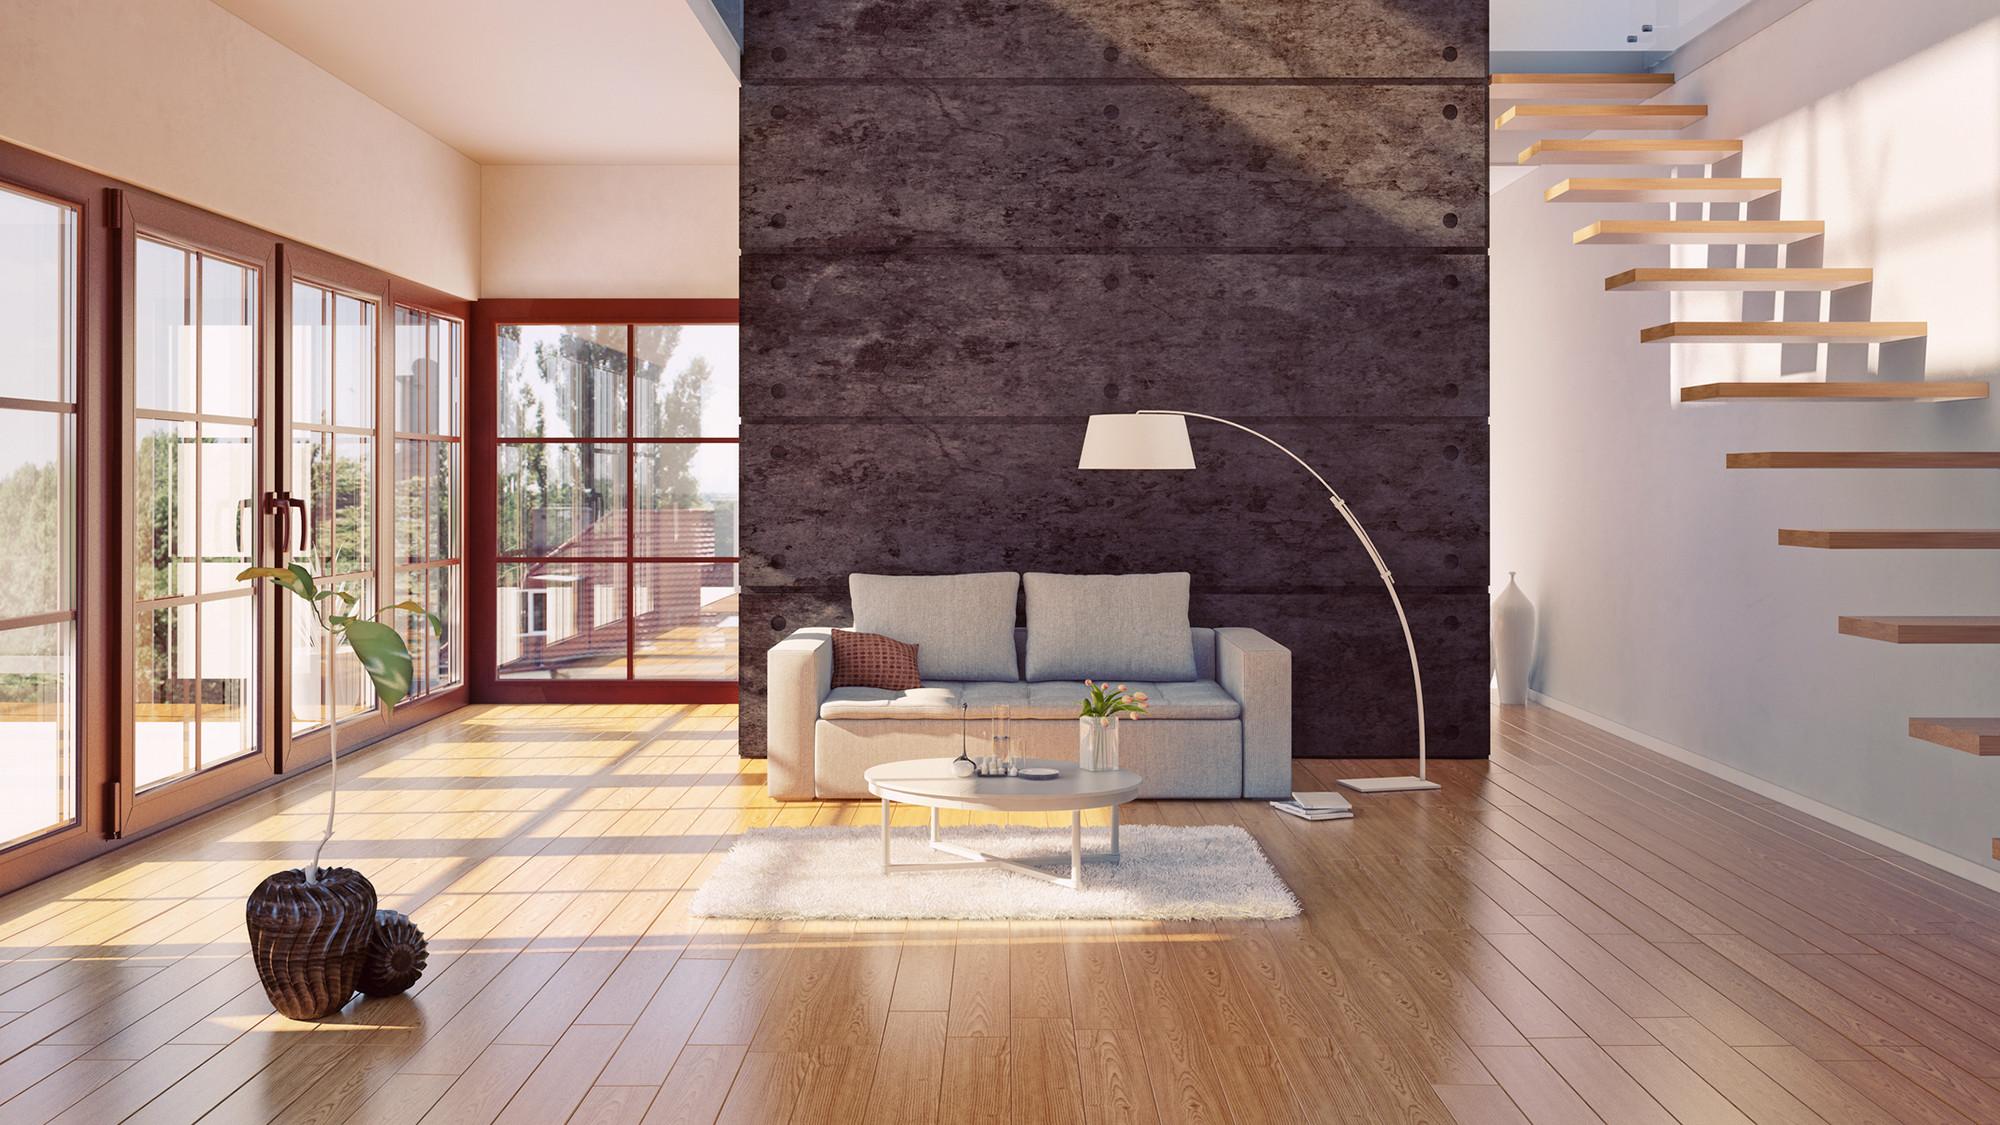 engineered vs solid hardwood flooring cost of do hardwood floors provide the best return on investment realtor coma in hardwood floors investment